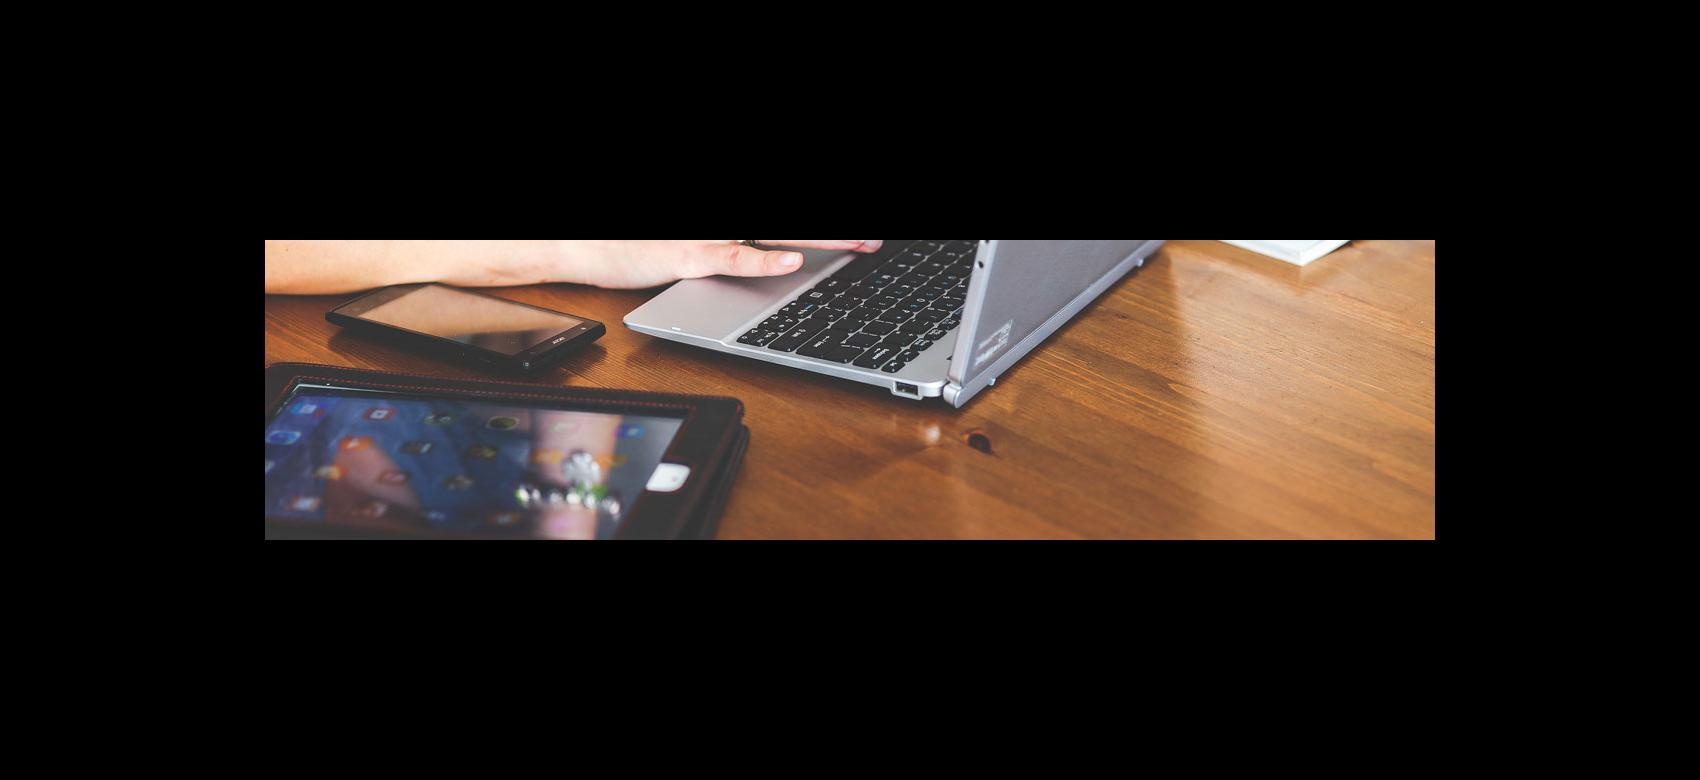 Teléfono y tableta